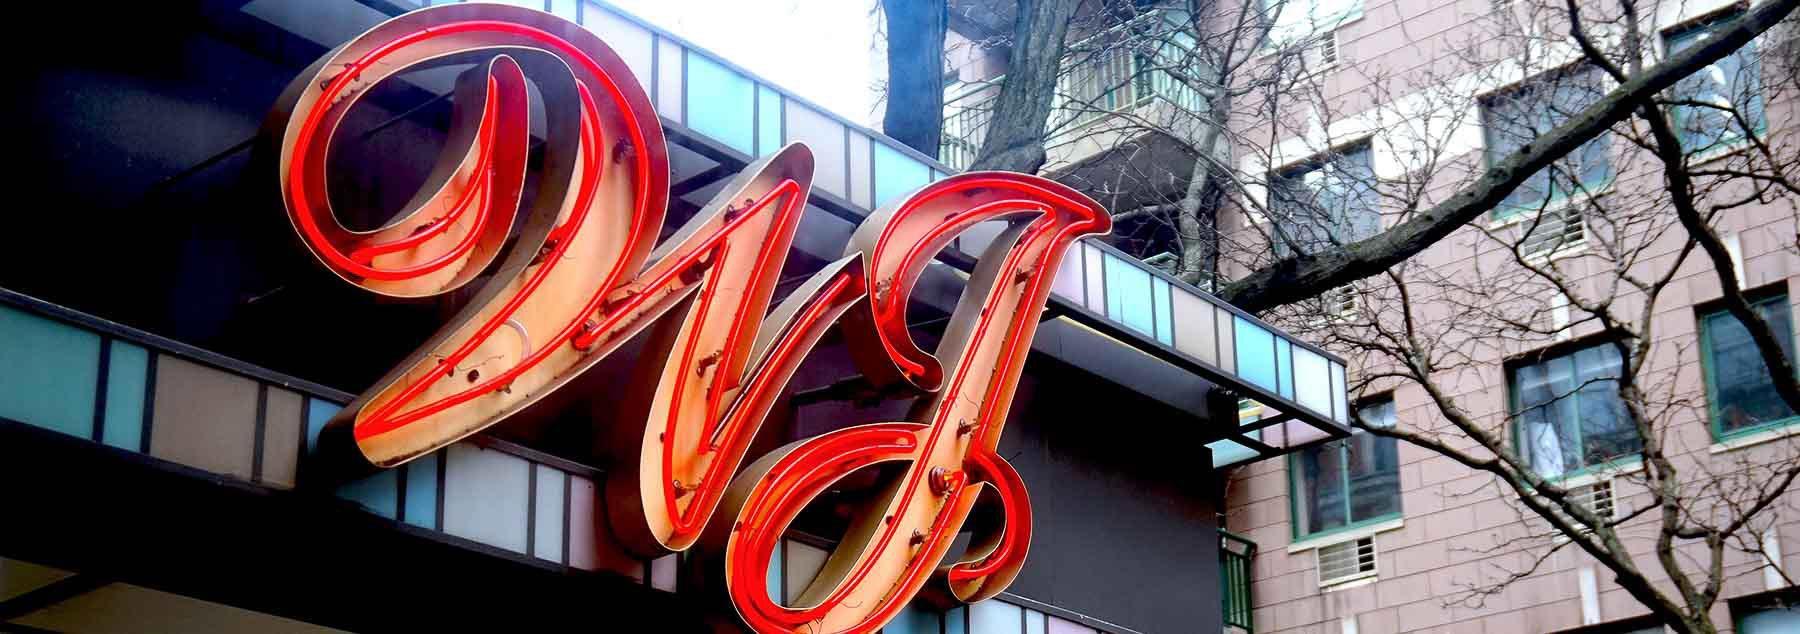 WJ Hotel New York